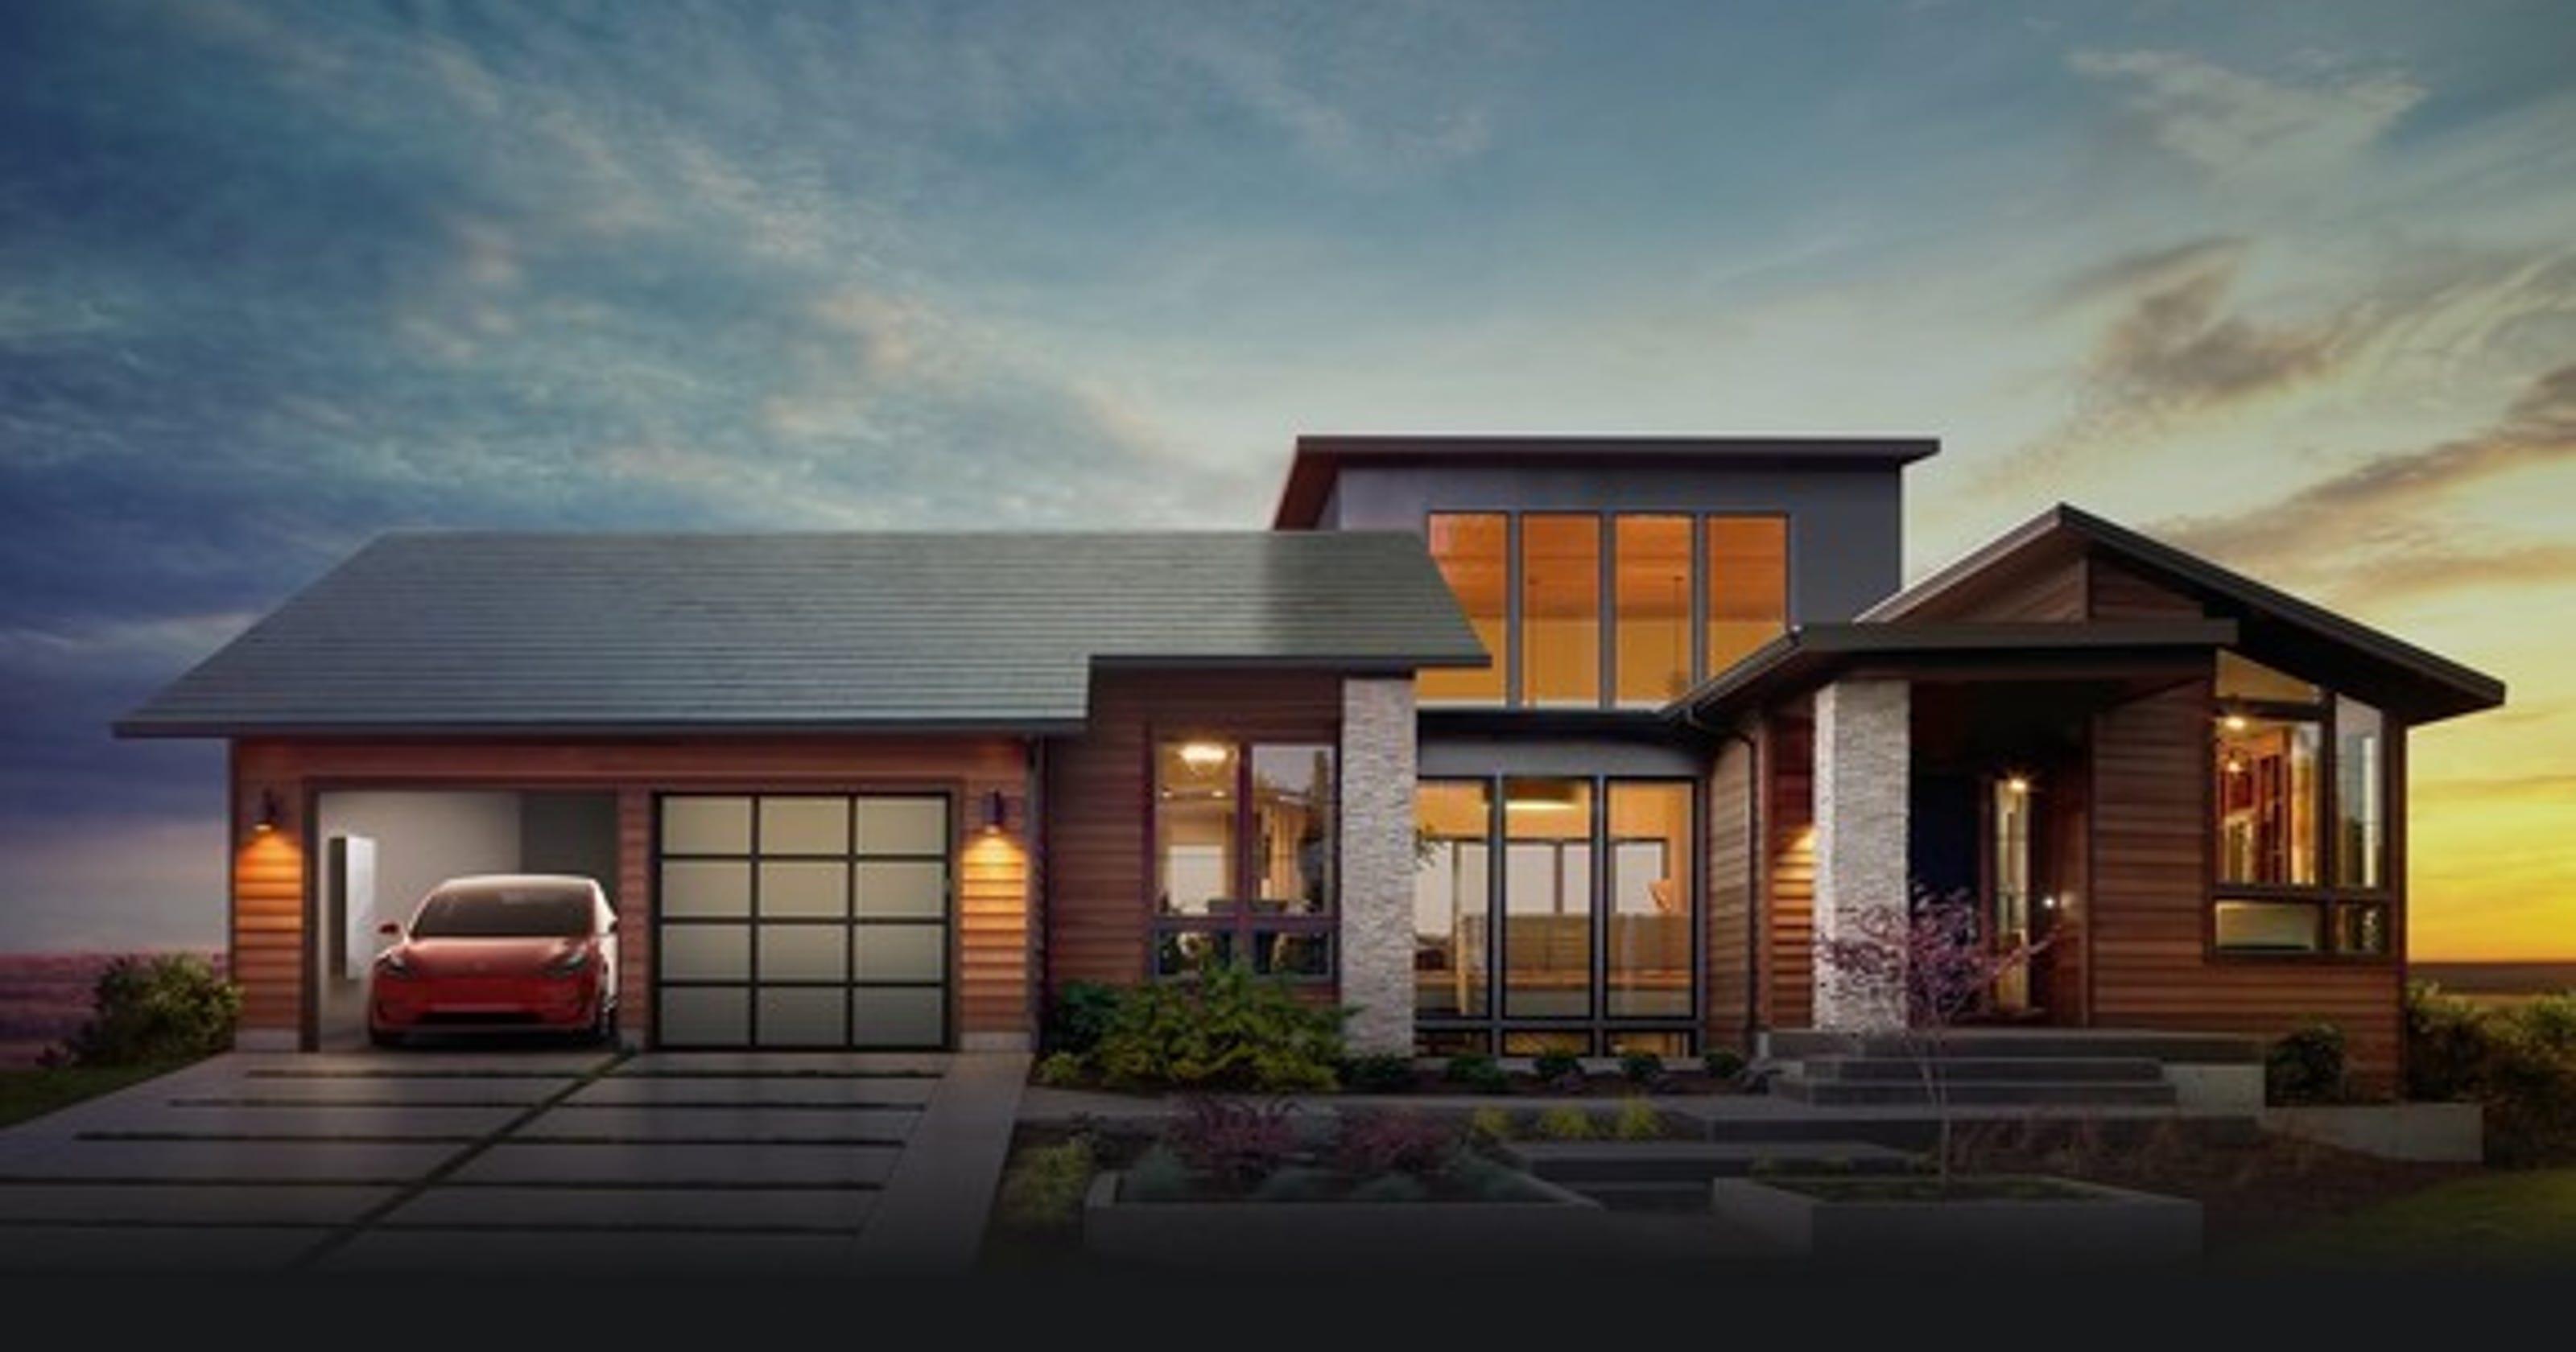 Tesla Solar Energy Kiosks Coming To Home Depot Locations